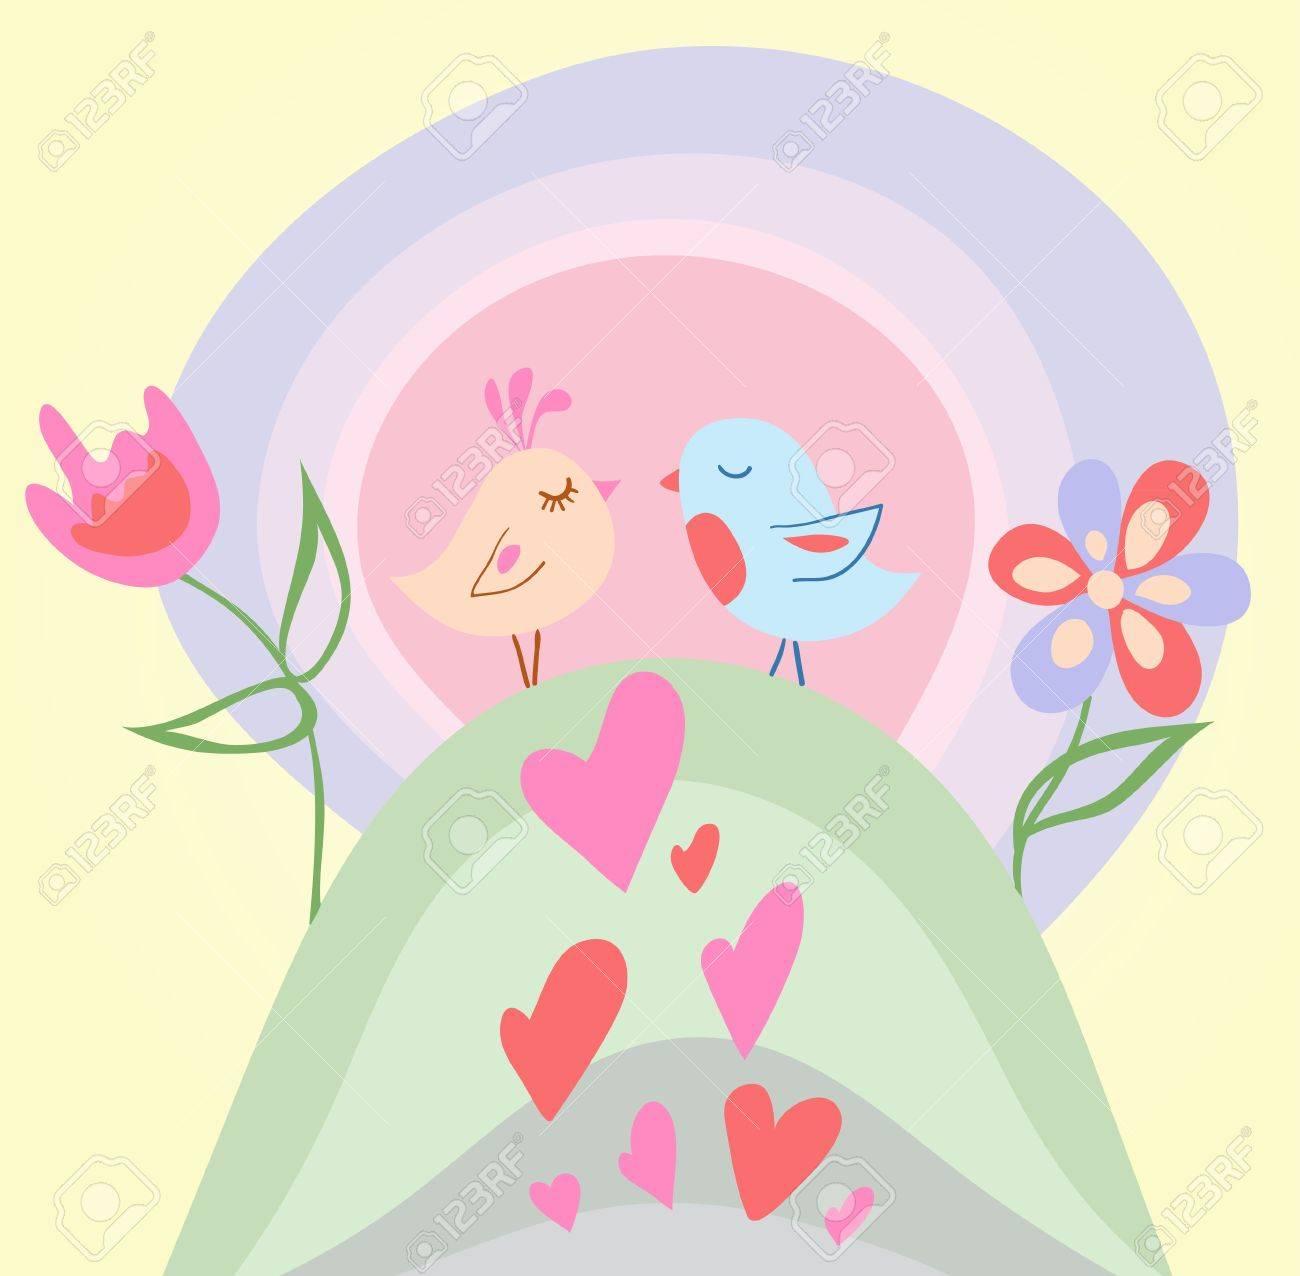 Tiny love bird illustration Stock Vector - 11433031